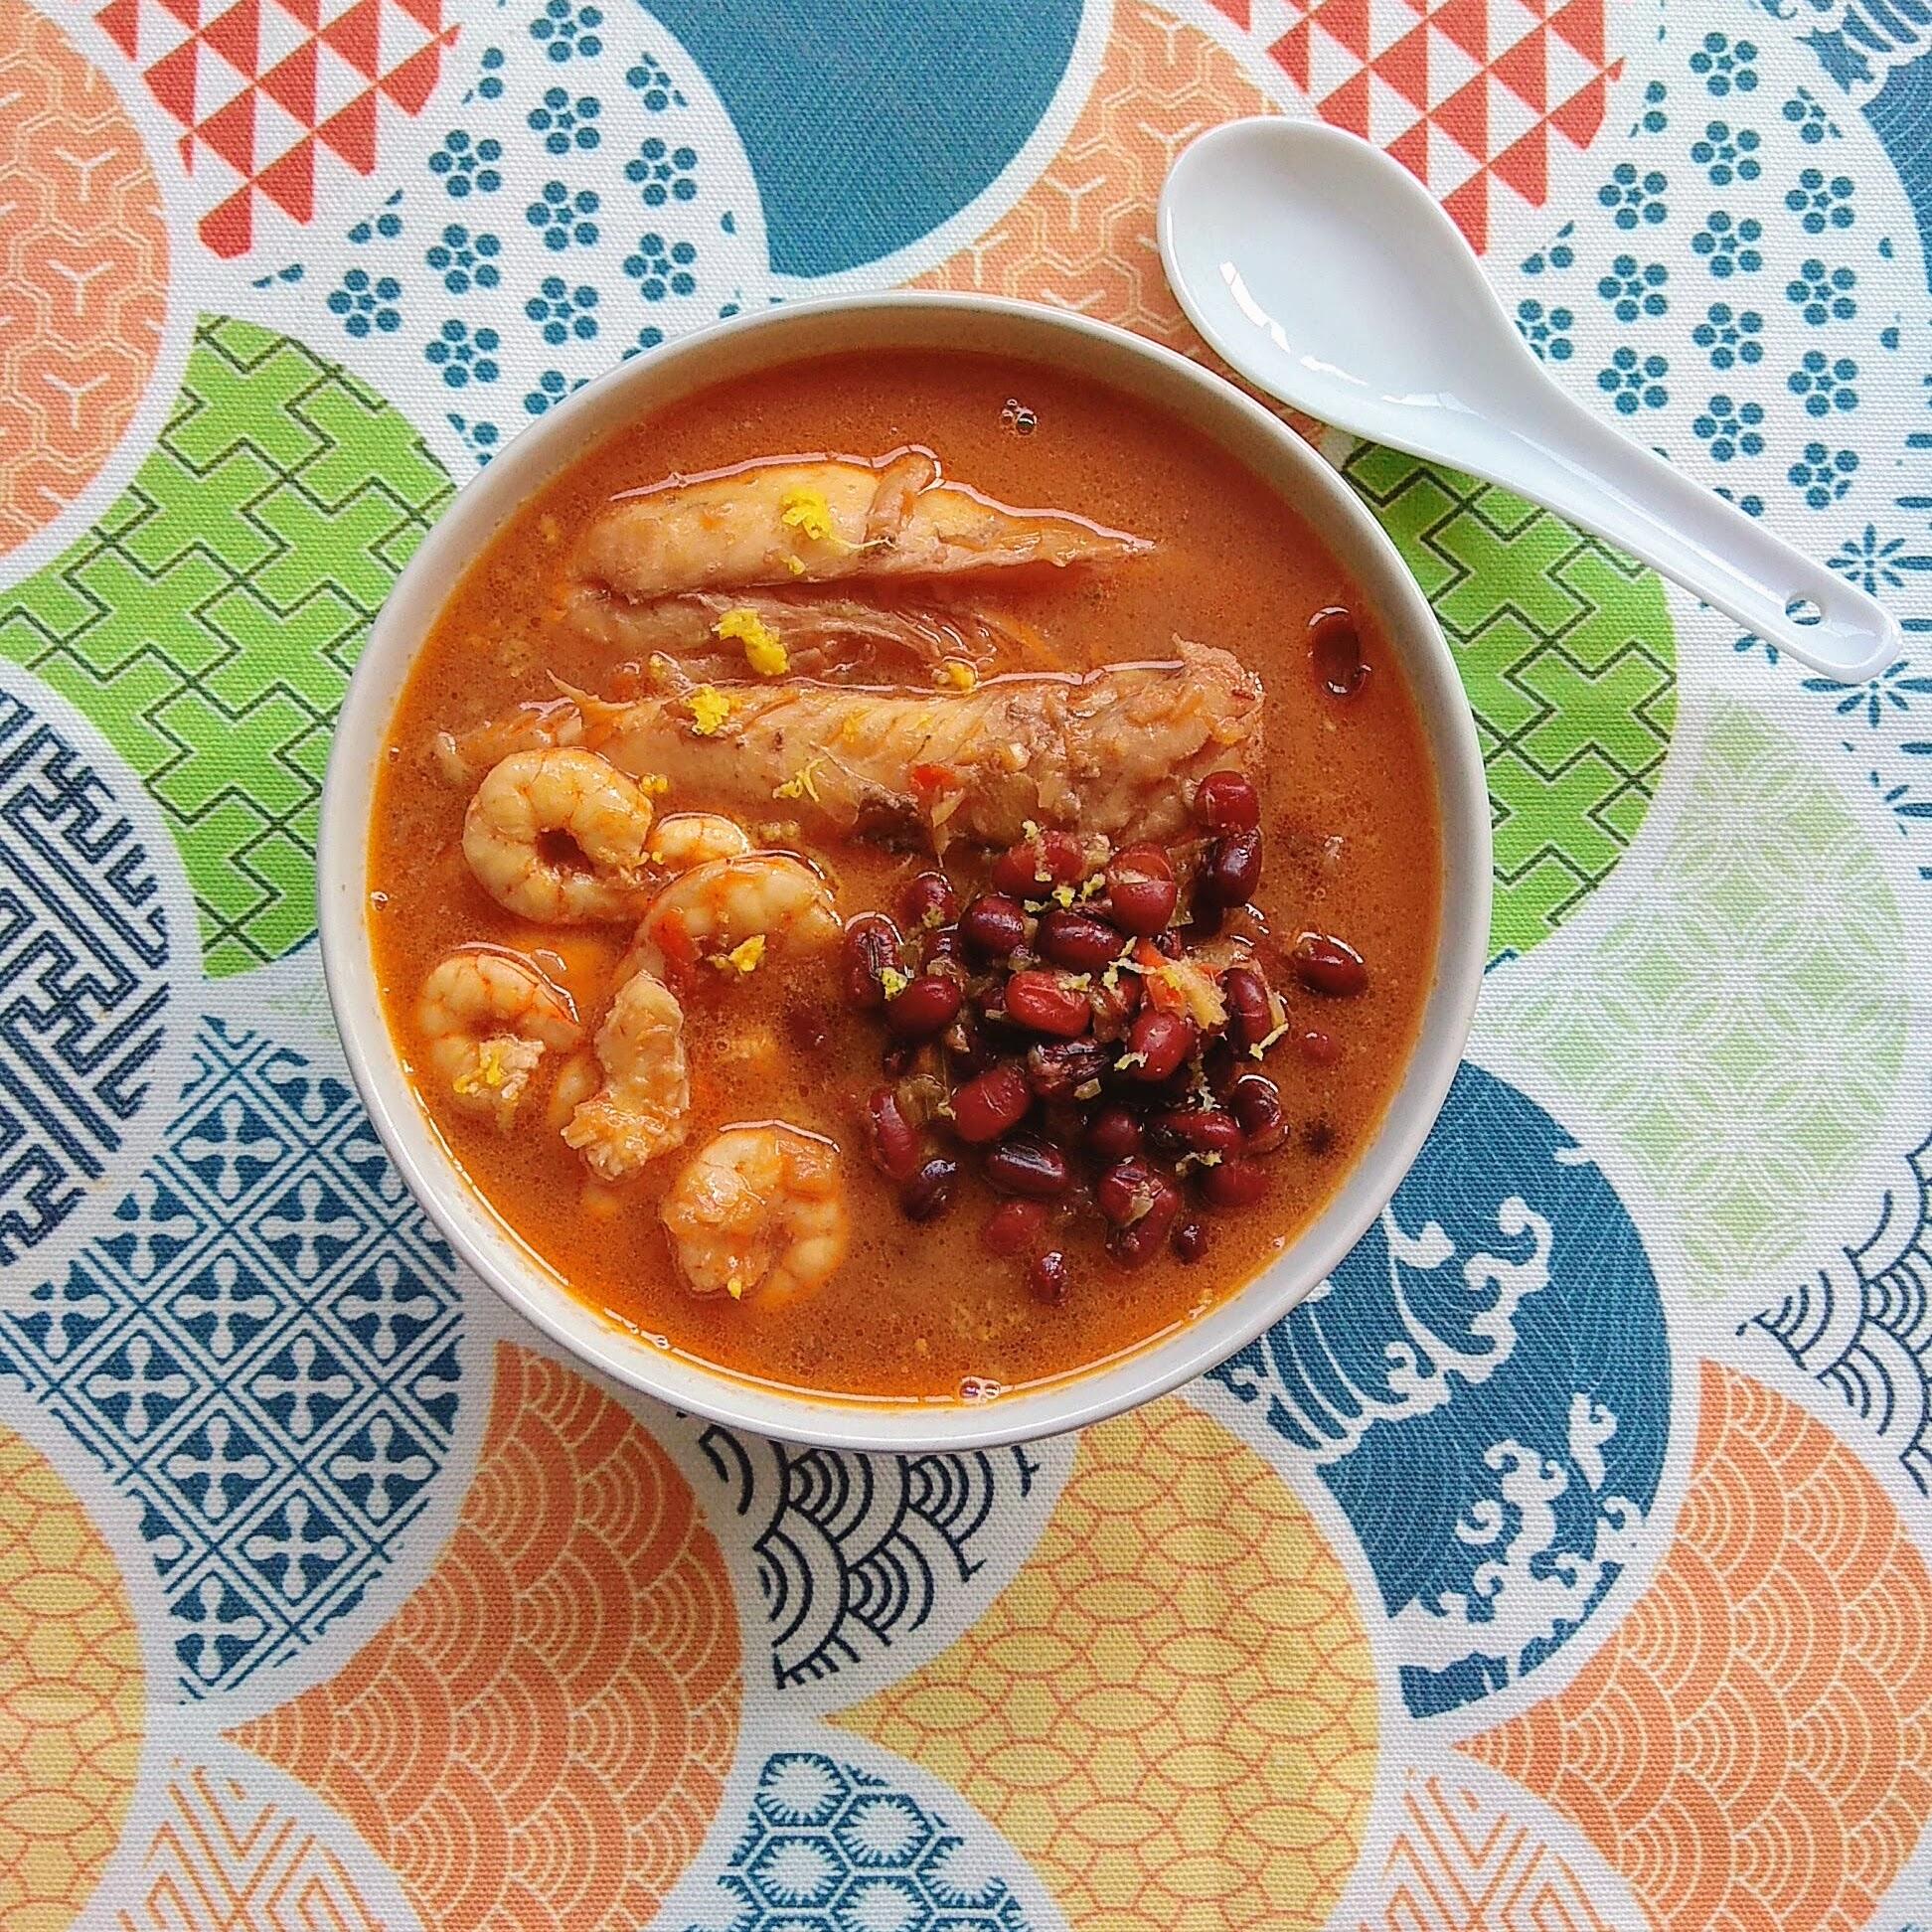 Receta fácil de Guiso de judías azuki con pescado. Descúbrela en: www.cocinandoconlola.com